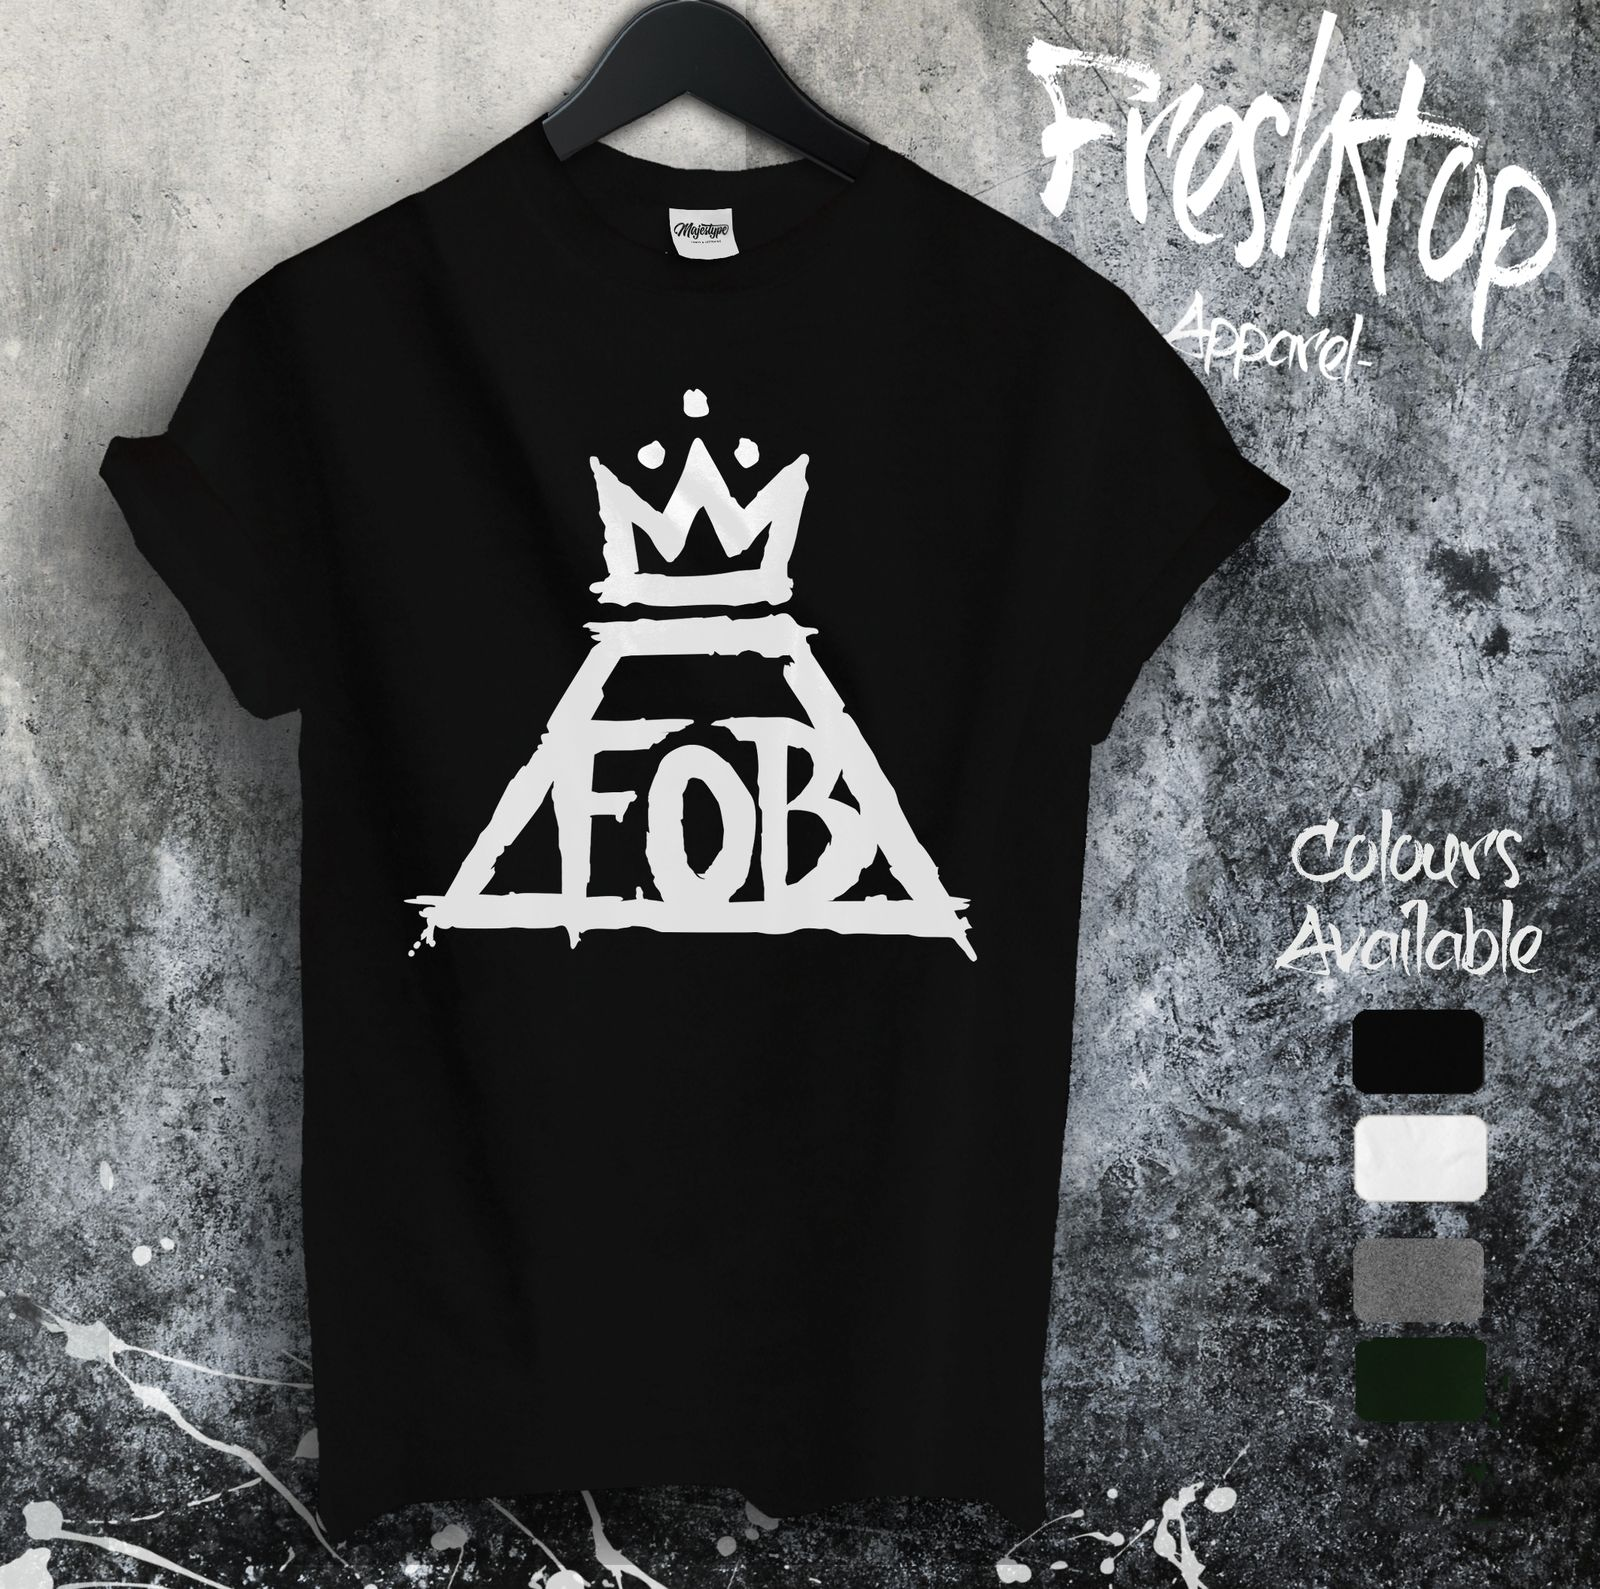 Gildan Fall Out Boy FOB T Shirt Rock N Roll Crown Patrick Stump Panic! At The Disco MenS T-Shirts Short Sleeve O-Neck Cotton